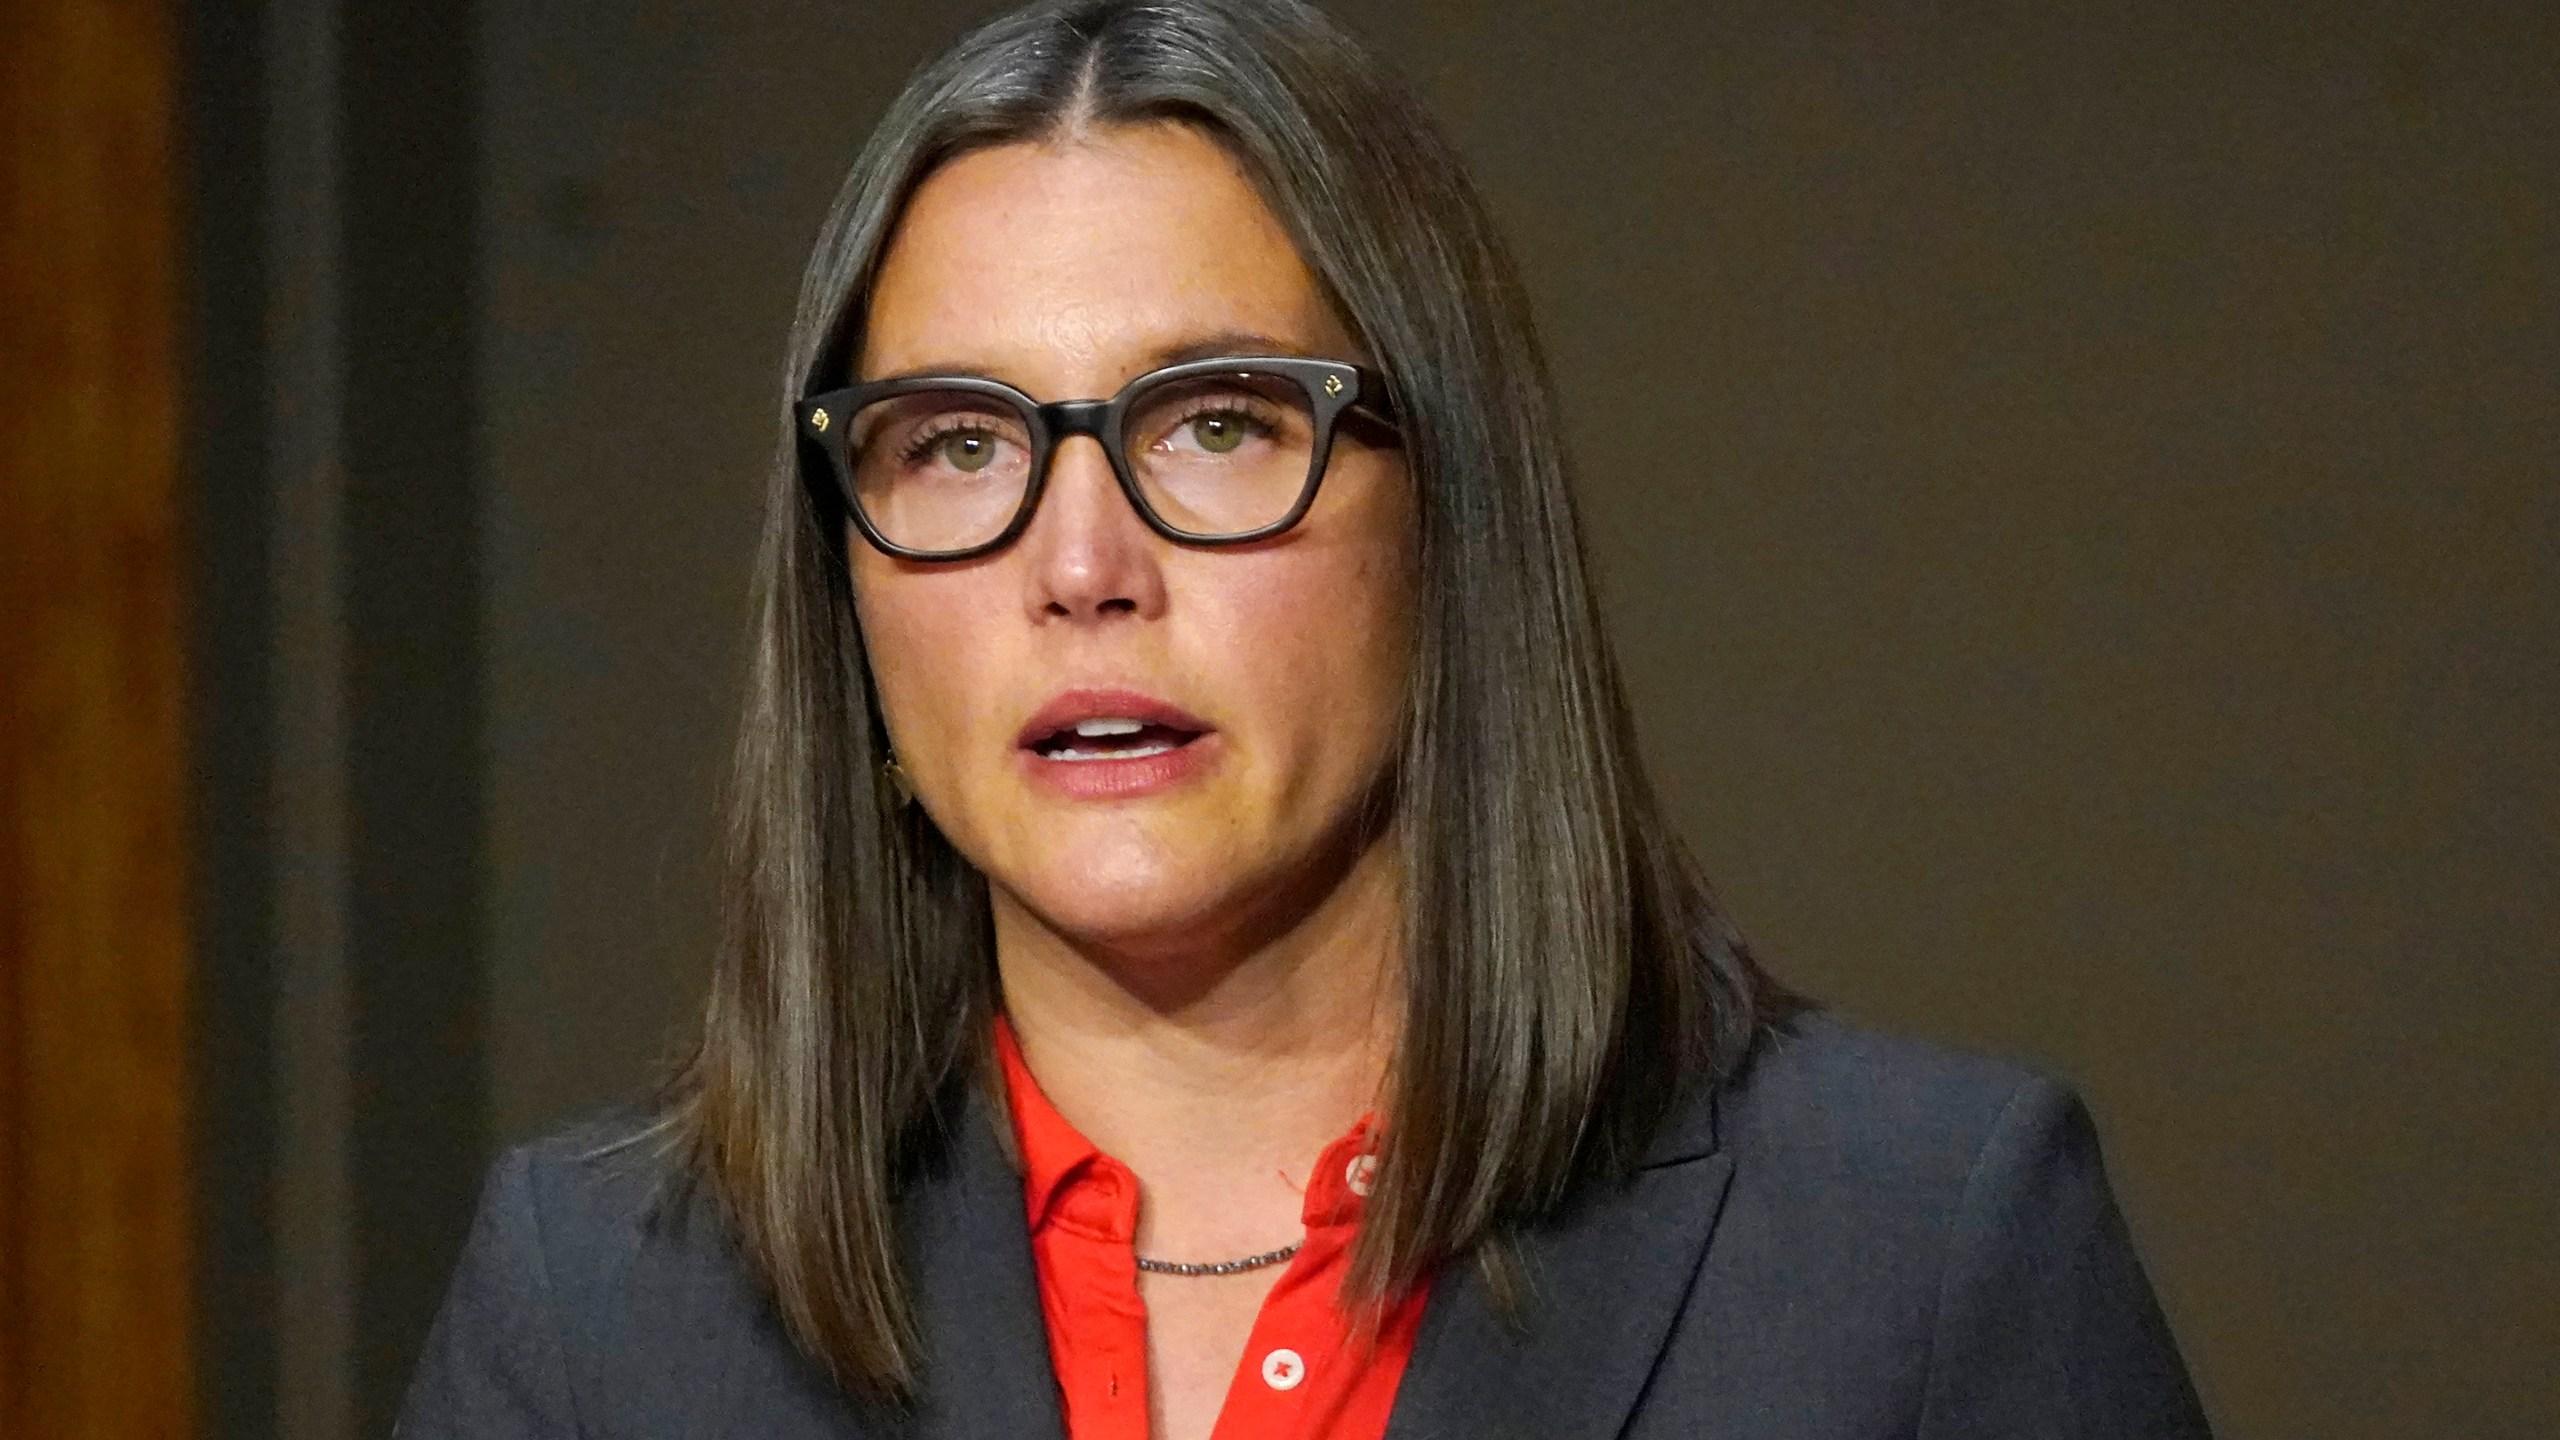 Erin Mendenhall